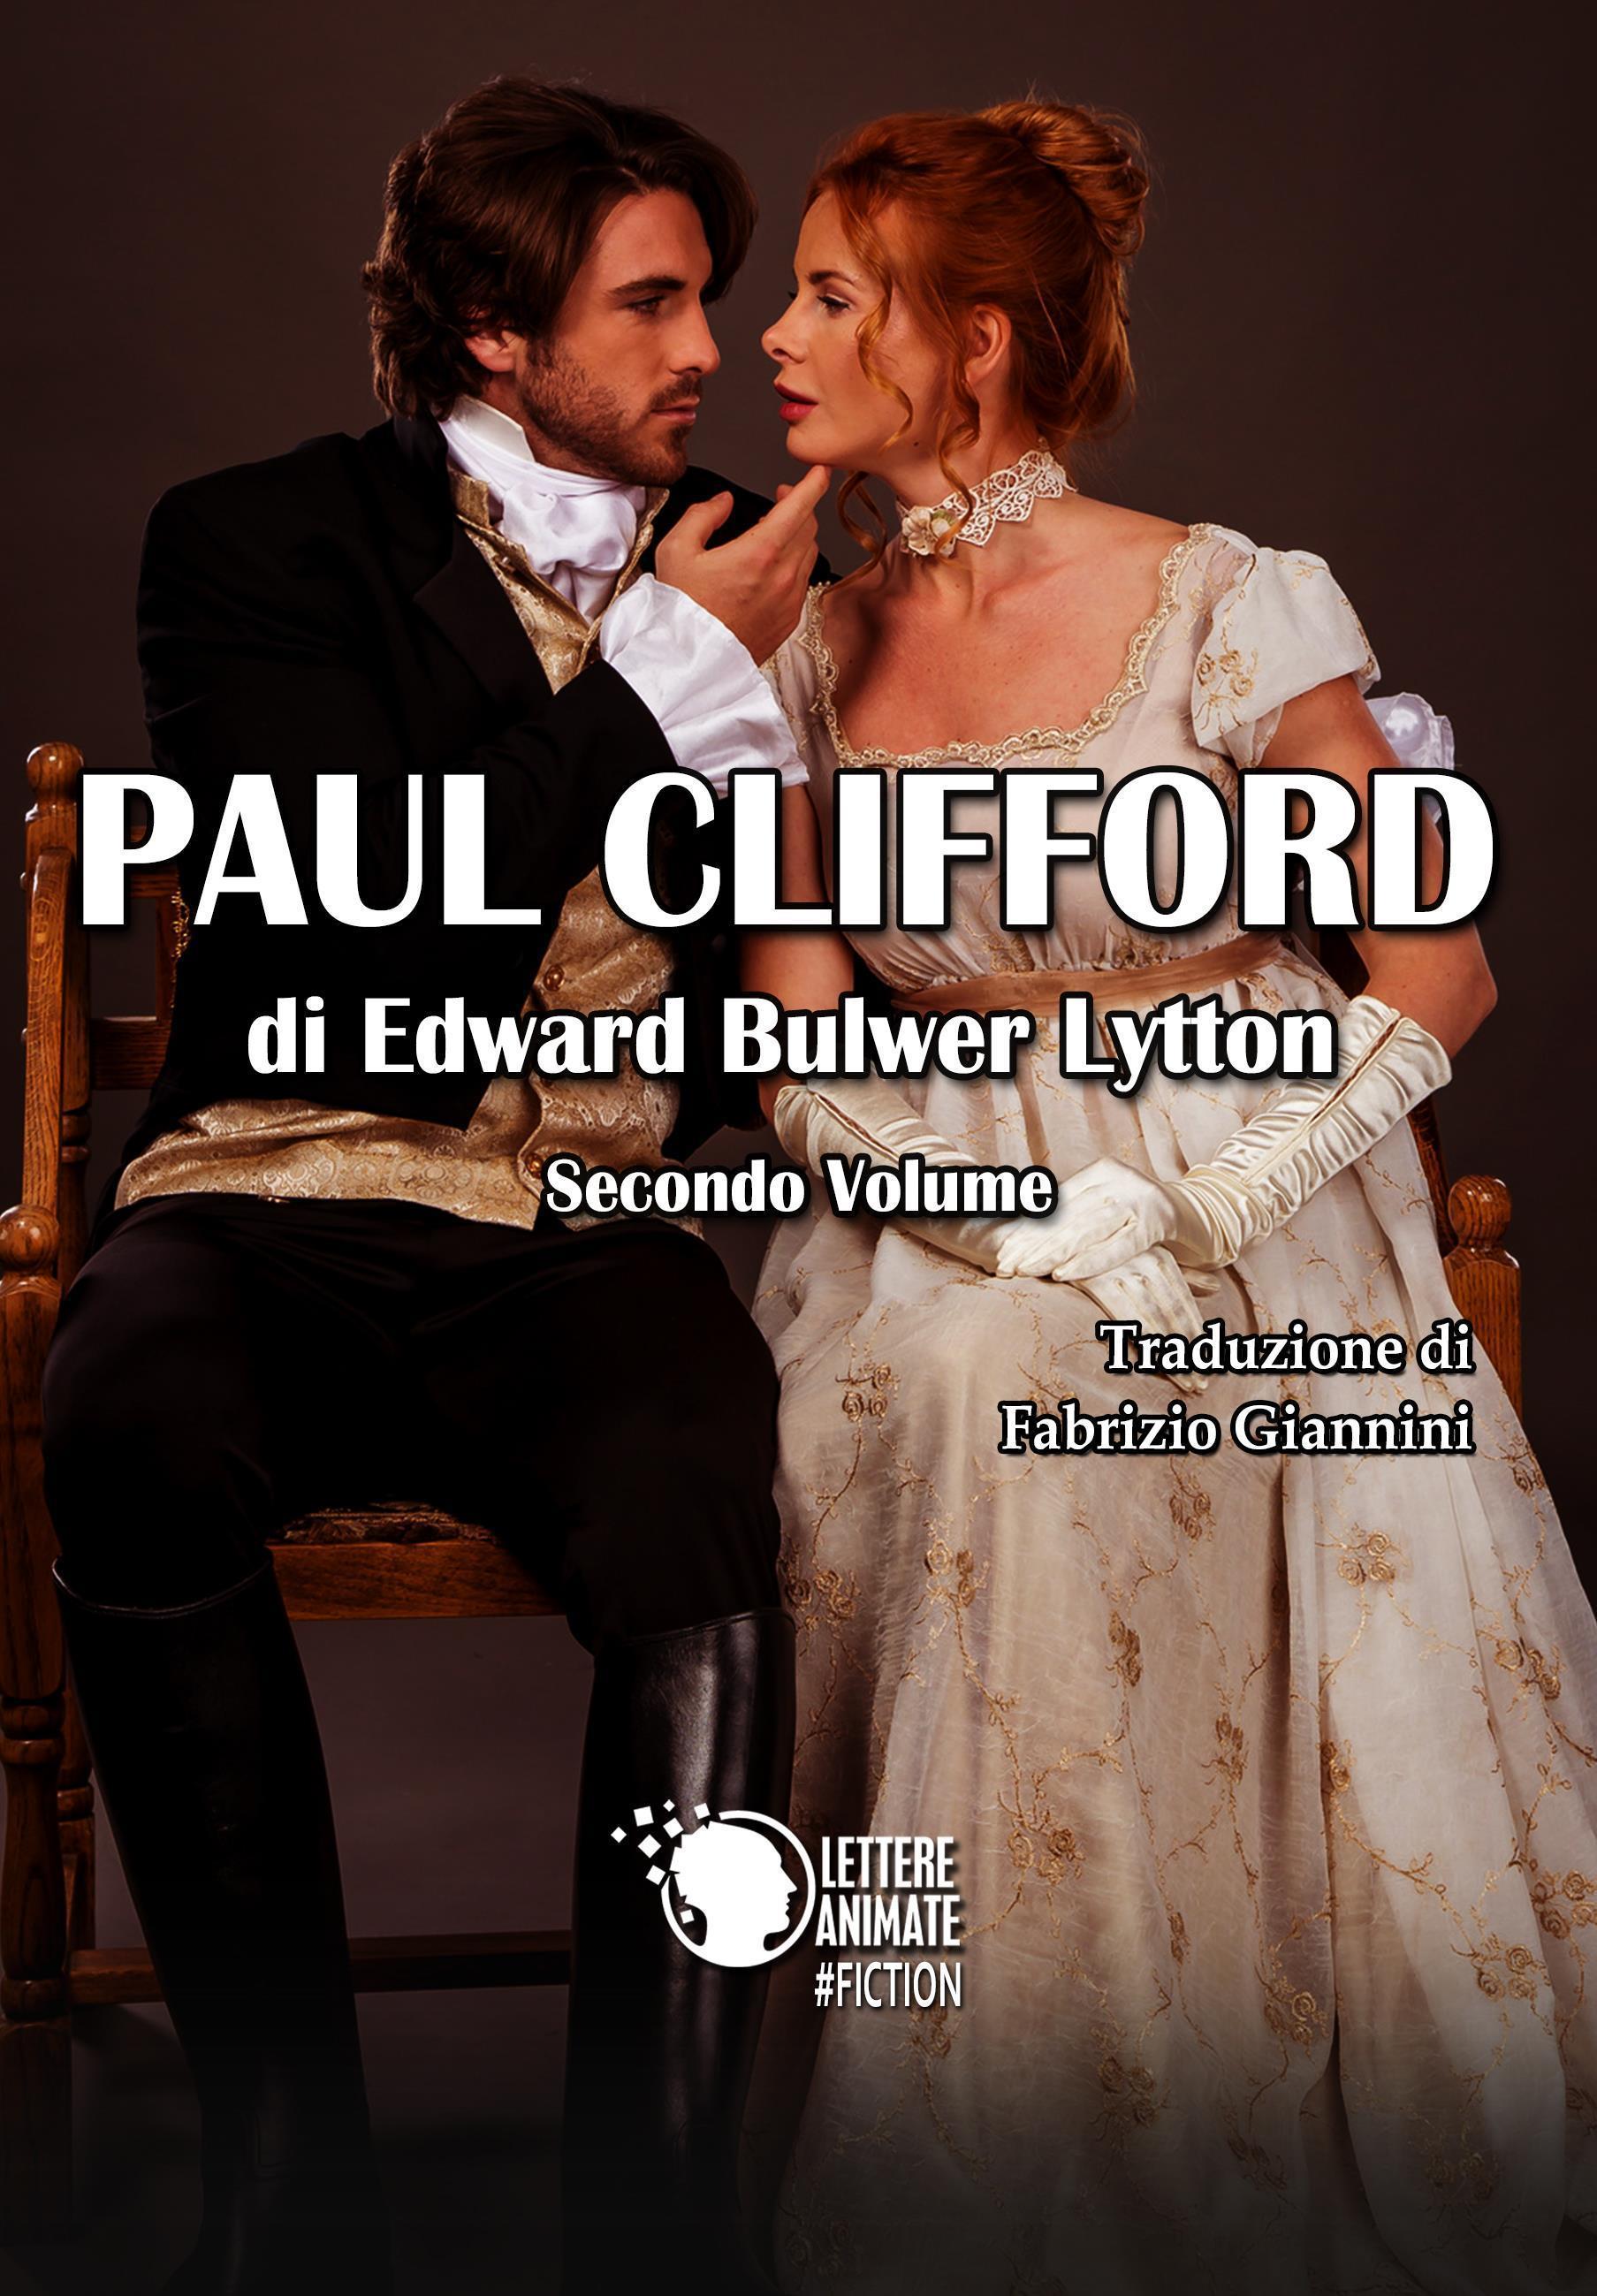 Paul Clifford - Volume secondo